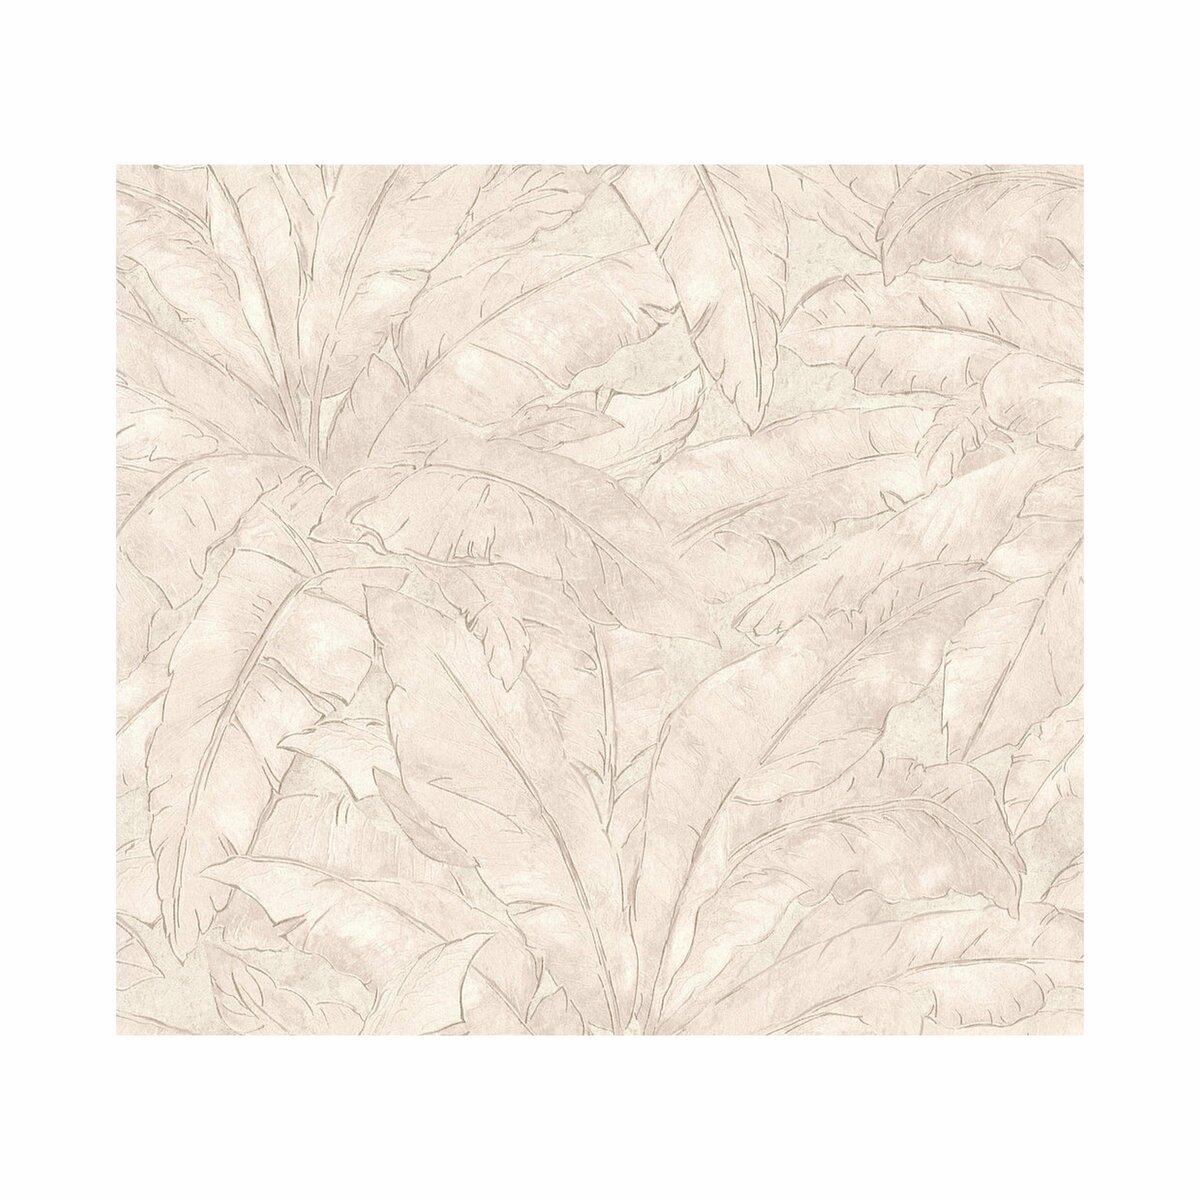 Bild 1 von AS_Creation -             A.S. Création Vliestapete Metropolitan Stories 'Francesca' Milano, Blätter beige 10,05 x 0,53 m